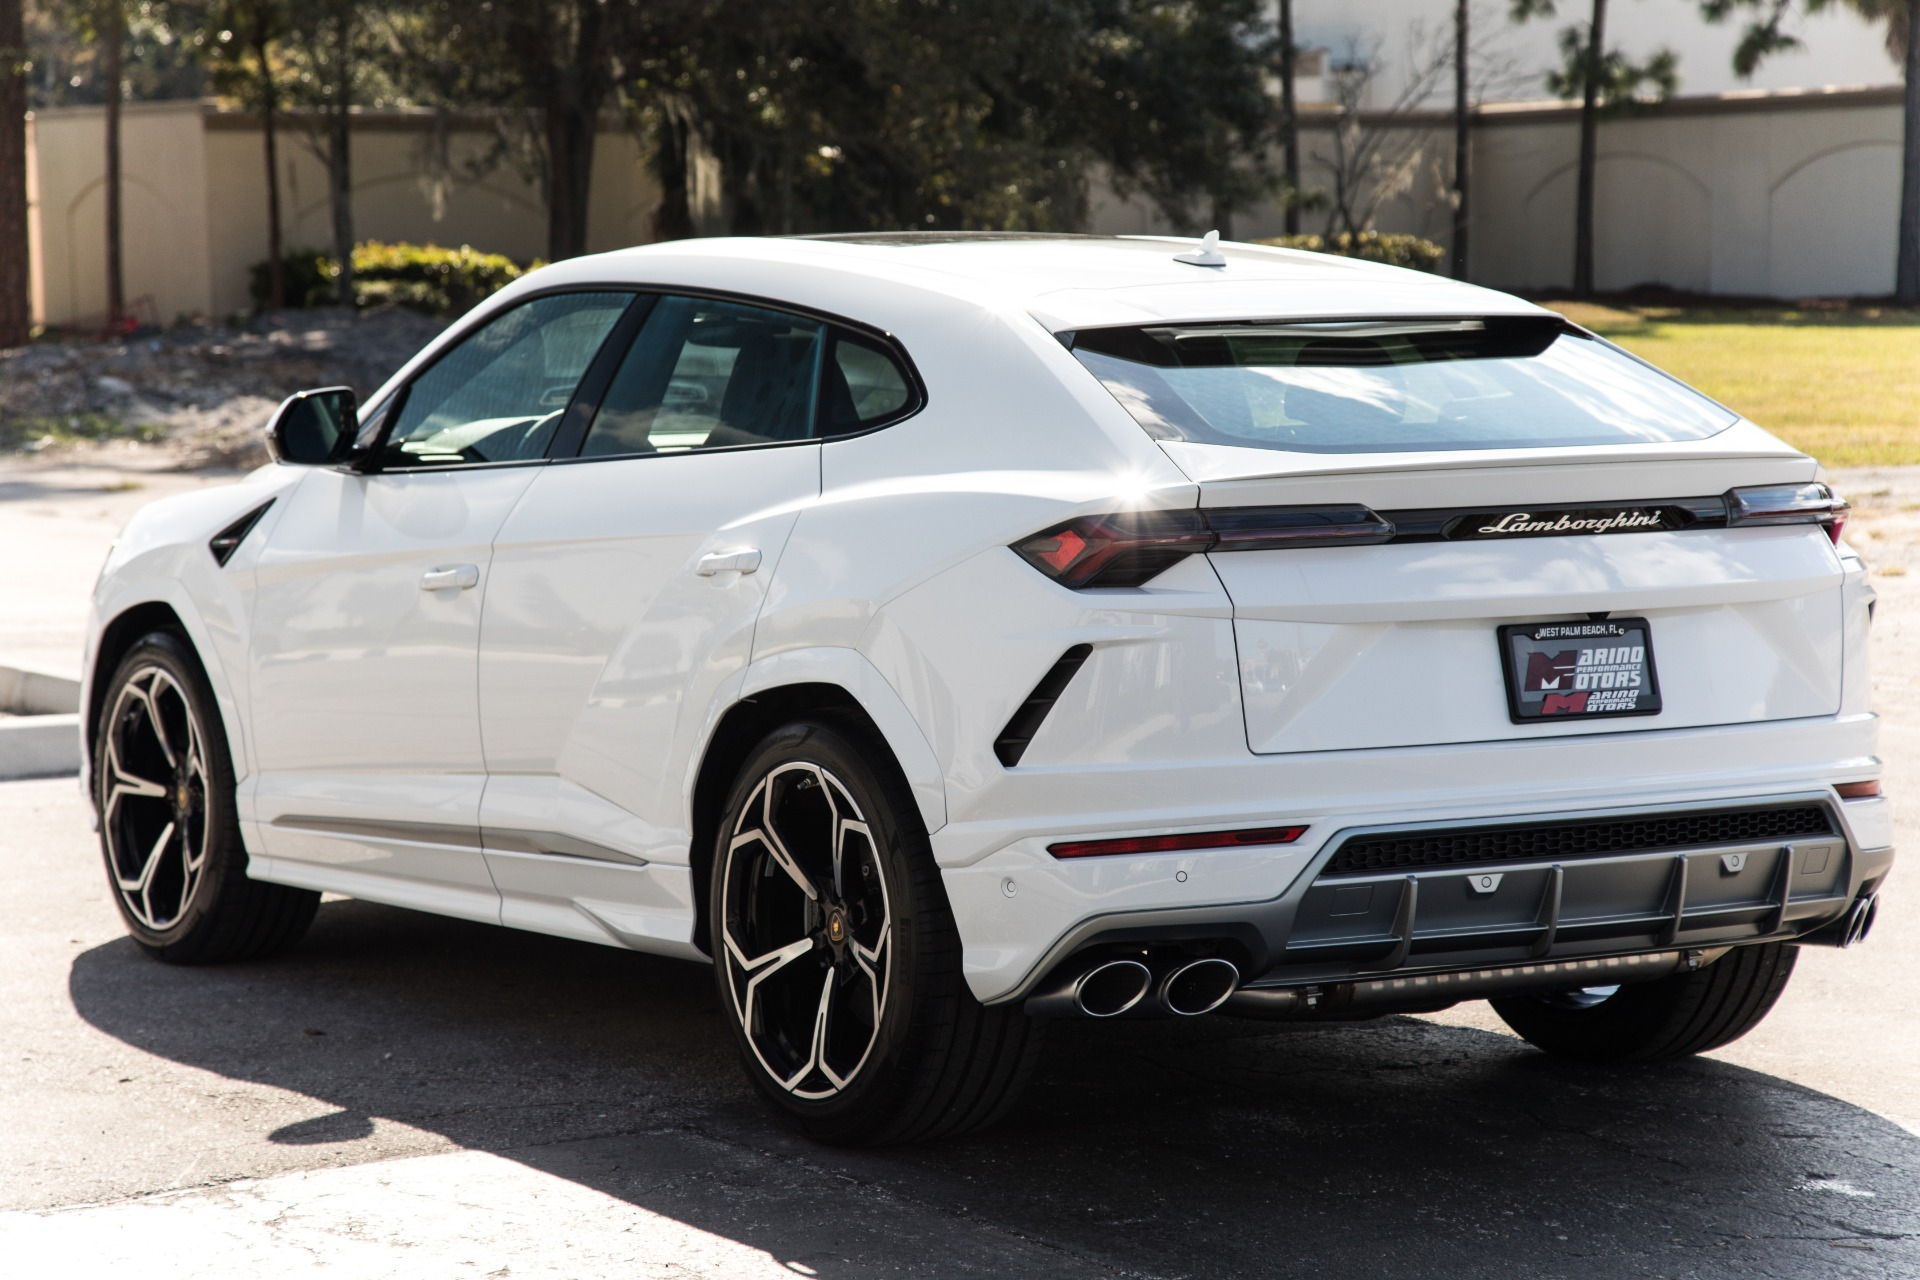 Used 2020 Lamborghini Urus For Sale 239 900 Marino Performance Motors Stock A07284